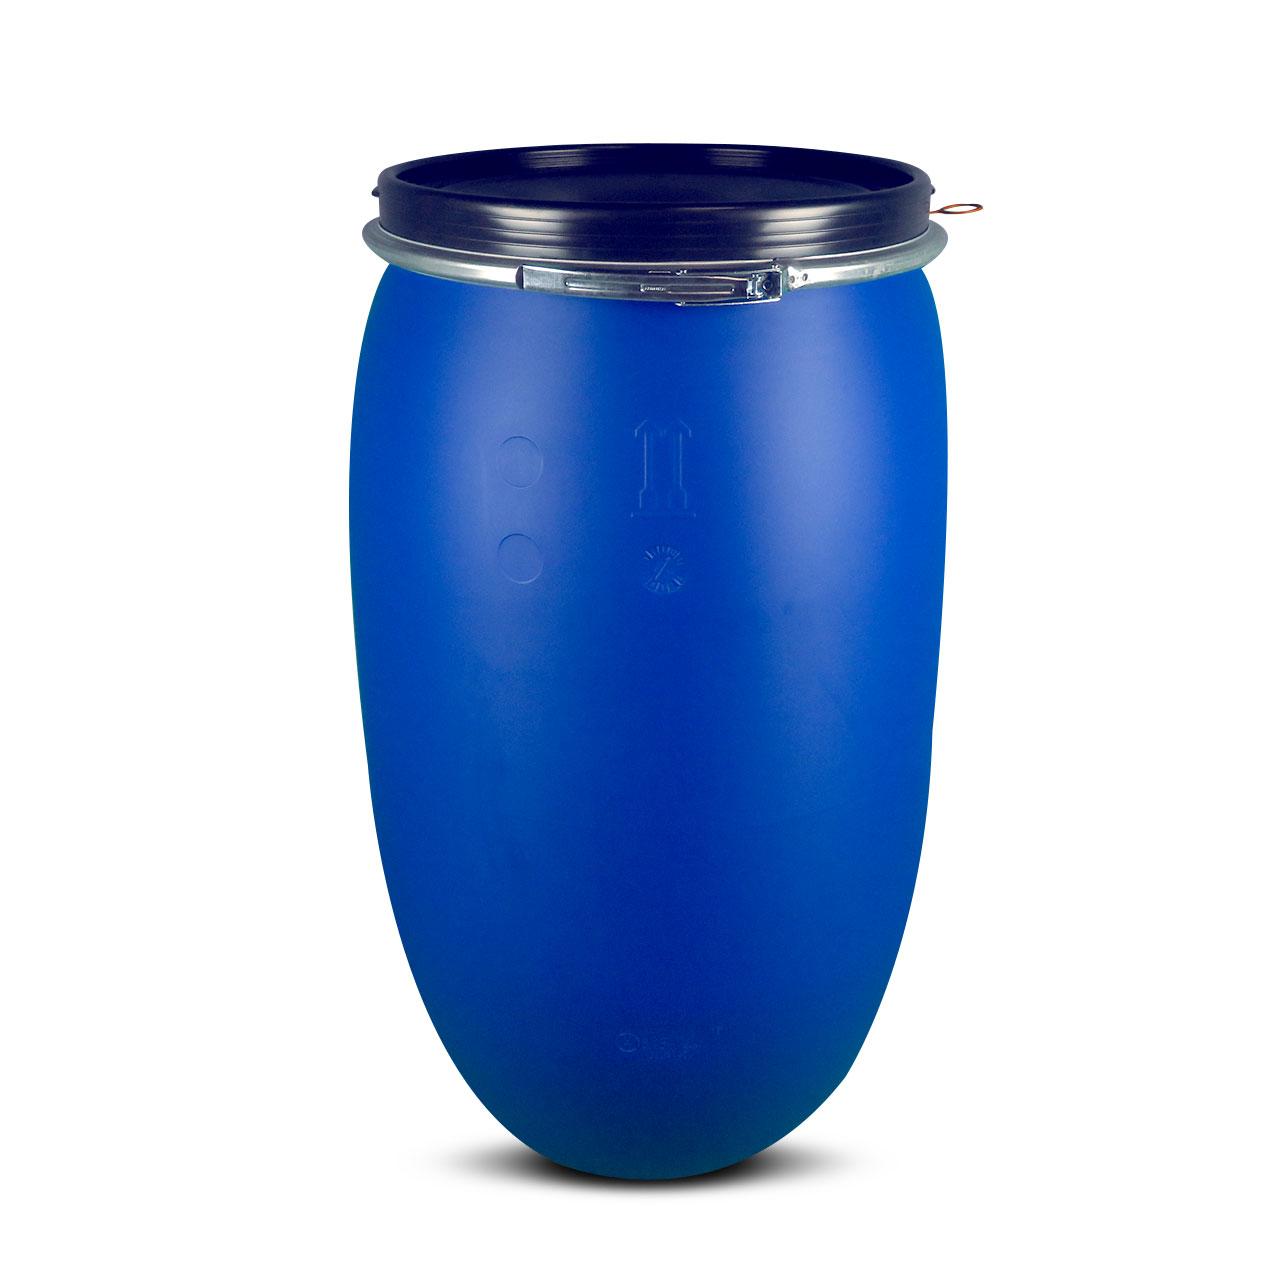 220 L Kunststoffdeckelfass, blau, Entgasung, FDA, UN